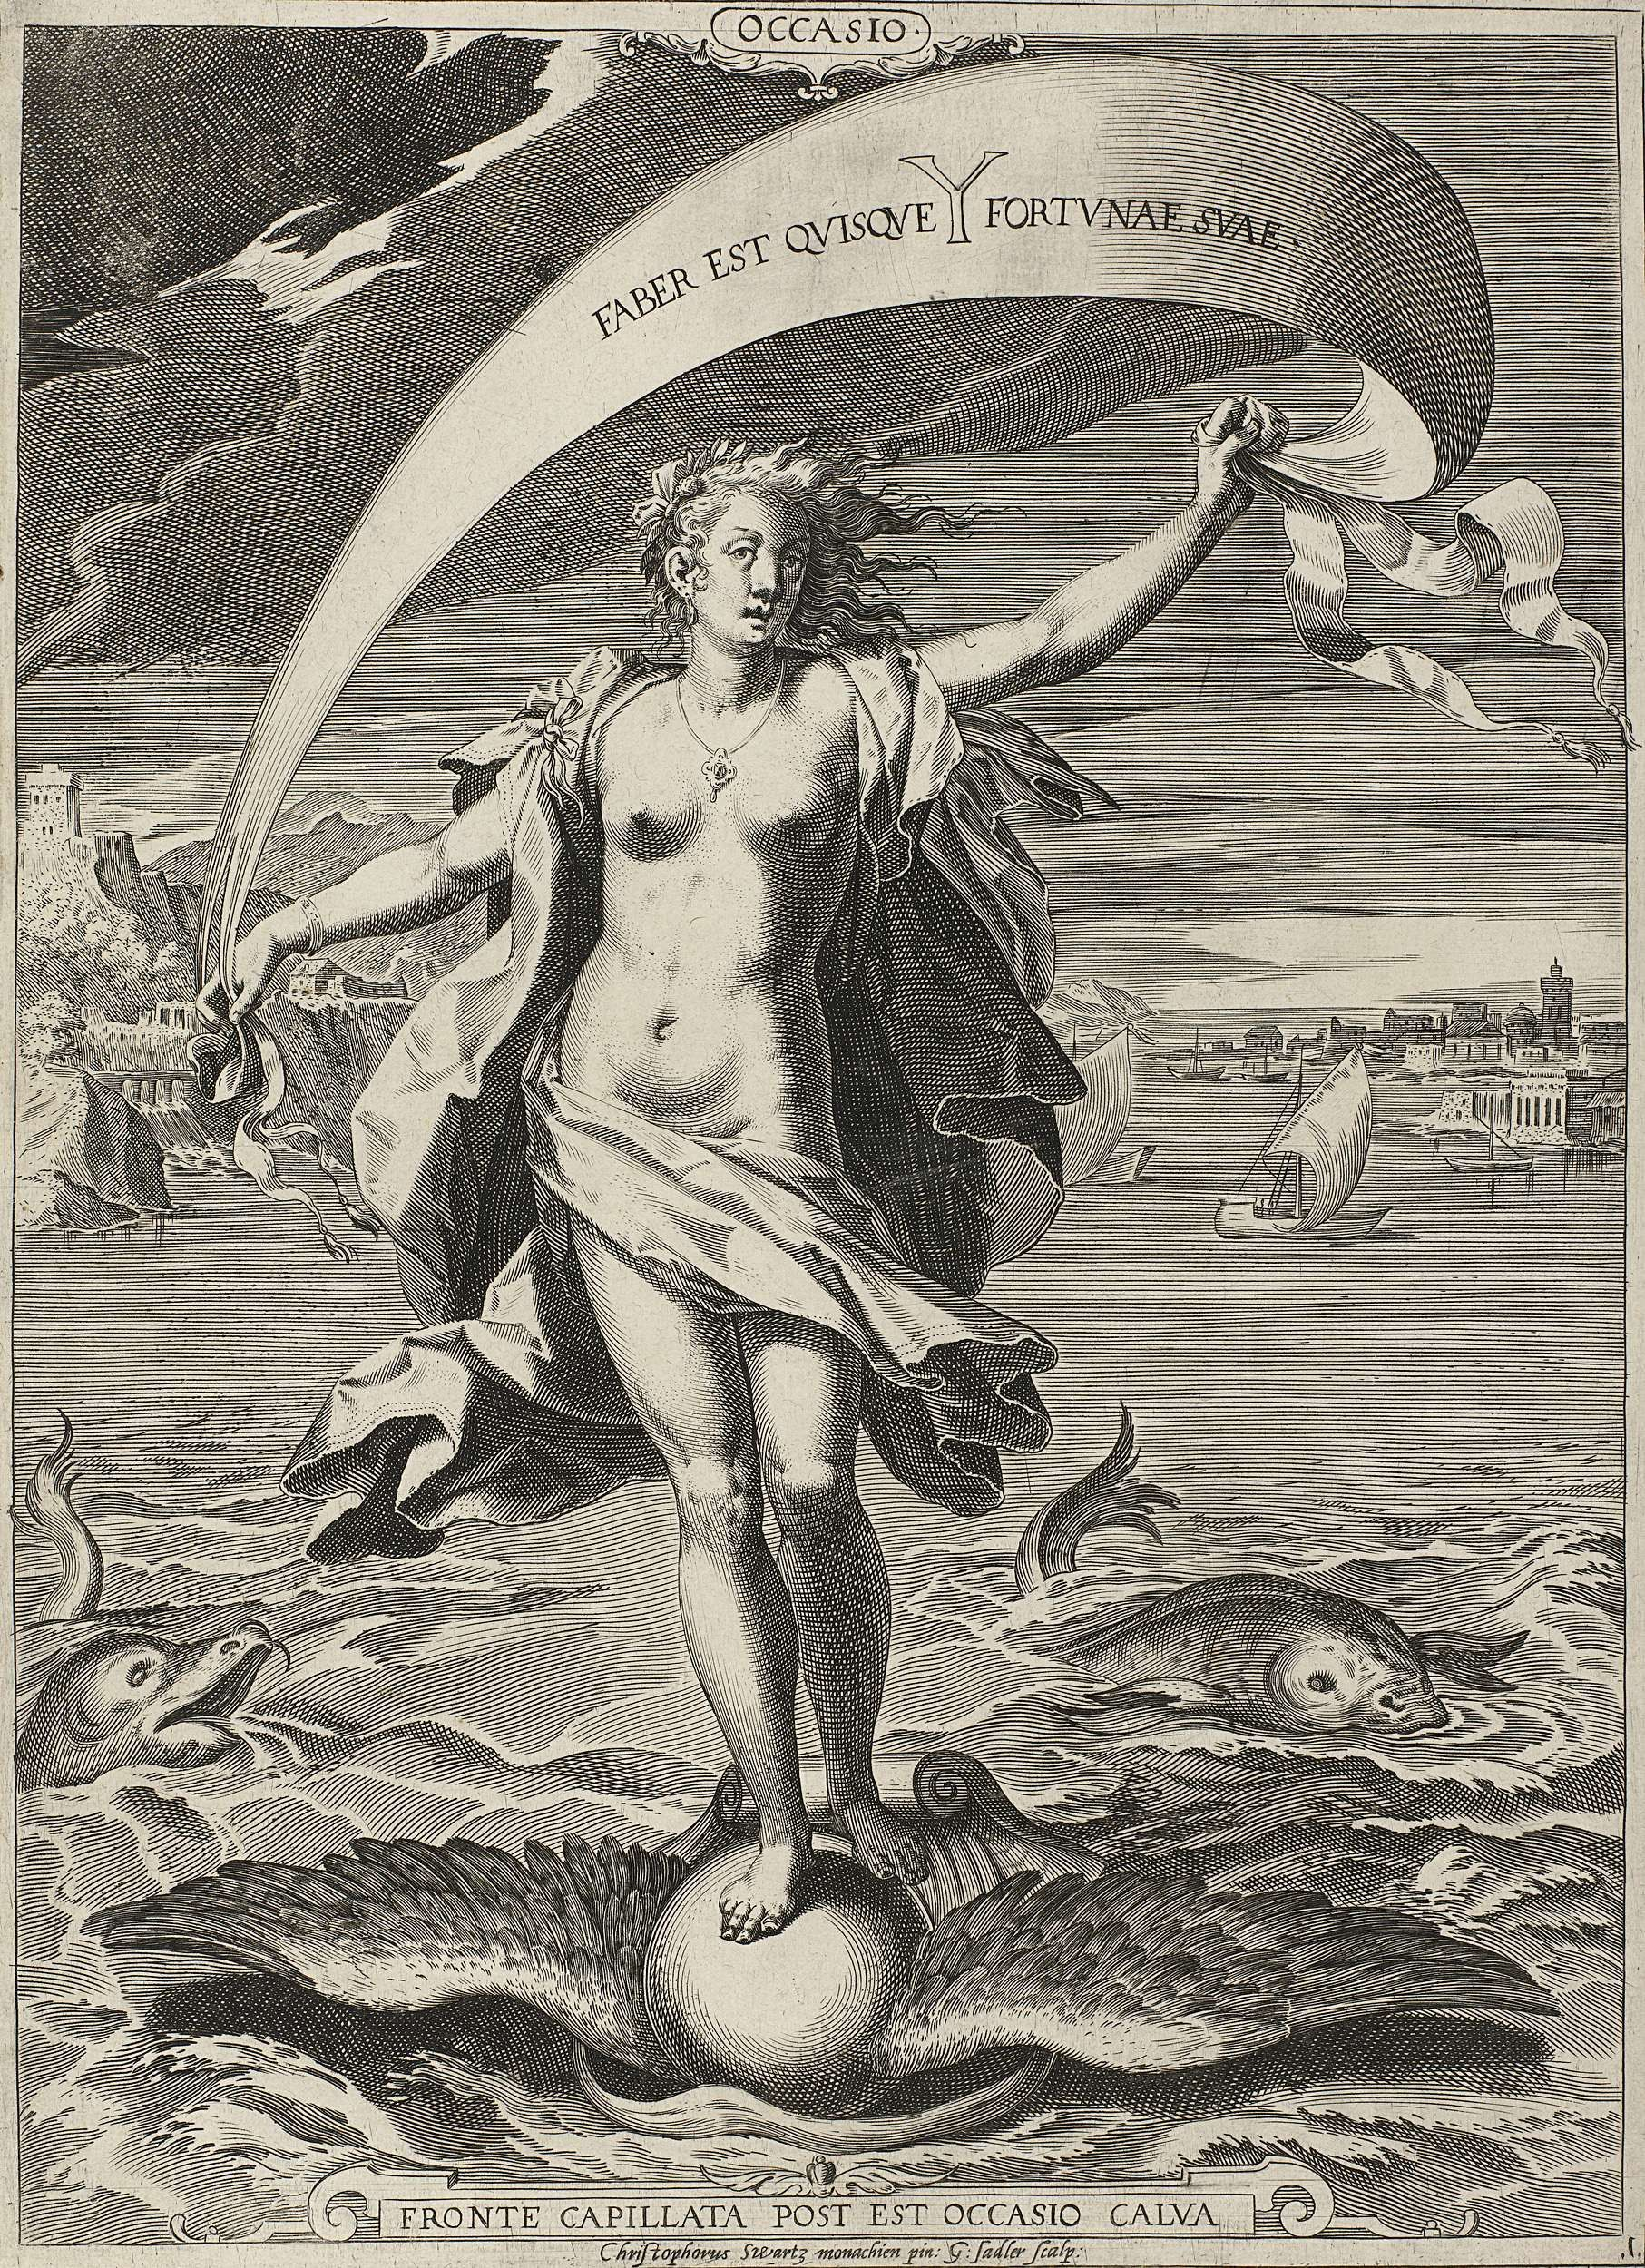 Aegidius Sadeler | Gelegenheid / Occasio, Aegidius Sadeler, 1580 - 1600 |  De personificatie Gelegenheid (Occasio) staat op een gevleugelde bol die op  een ...